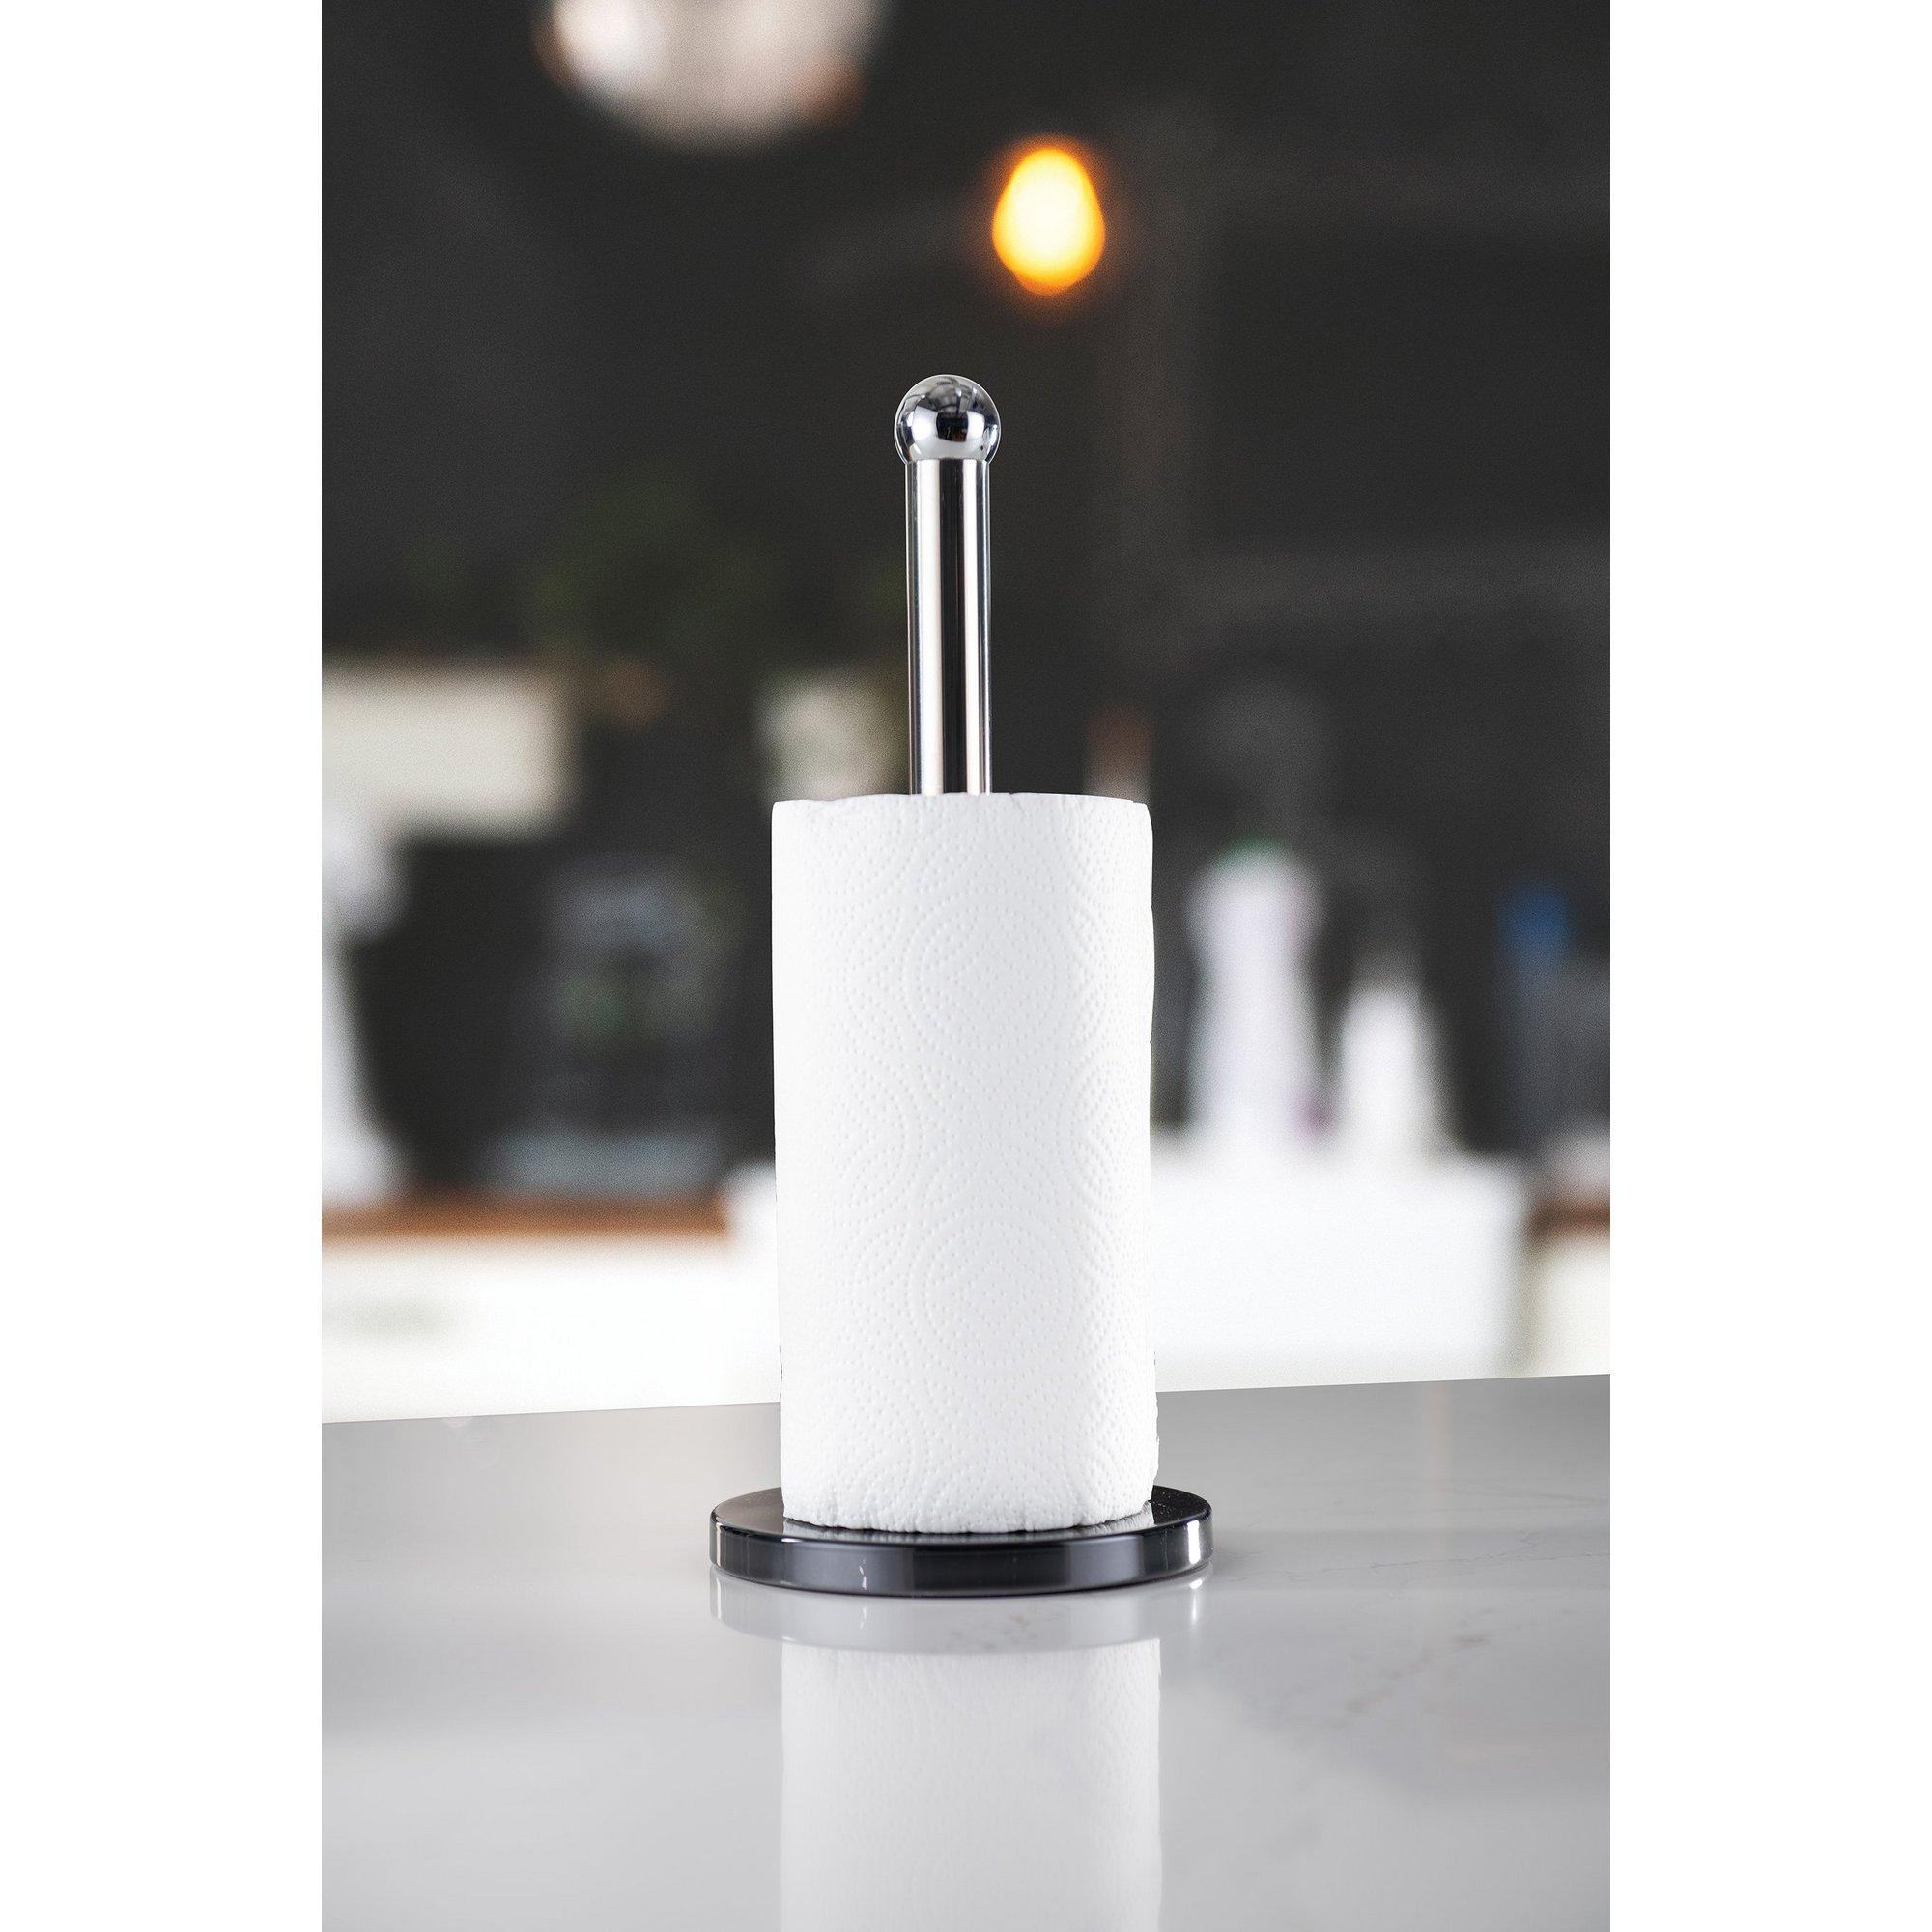 Image of Daewoo Callisto Ombre Kitchen Roll Holder